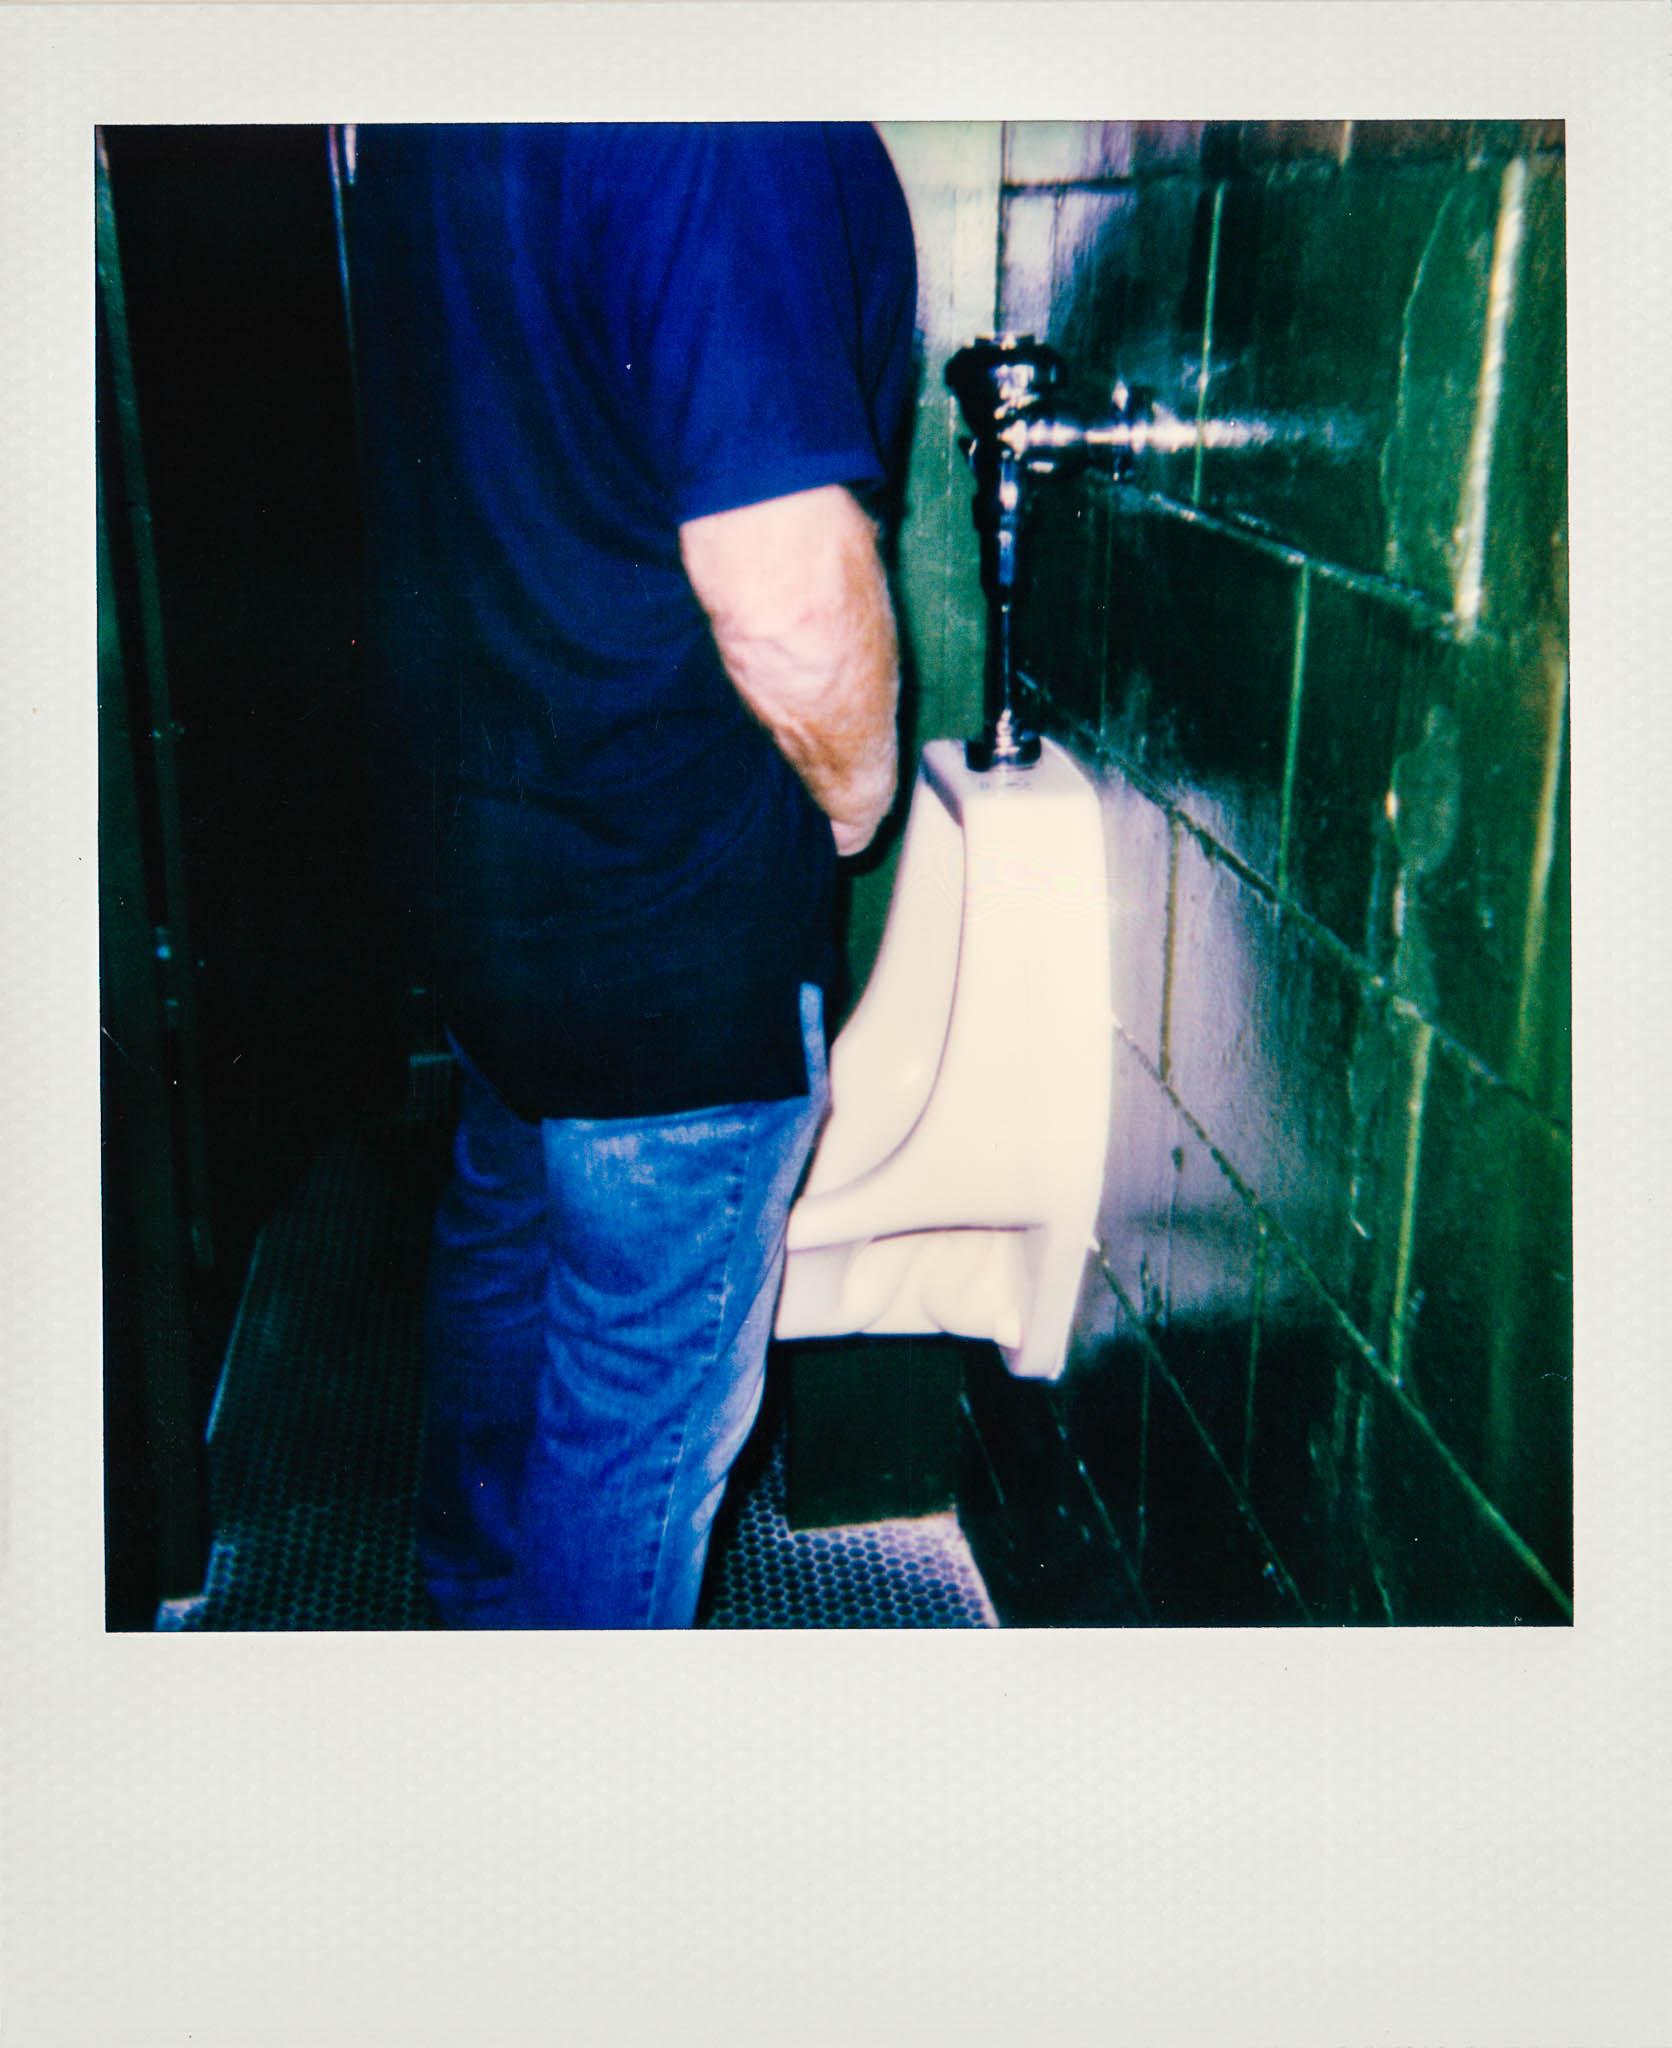 man-peeling-wallys-polaroid.jpg